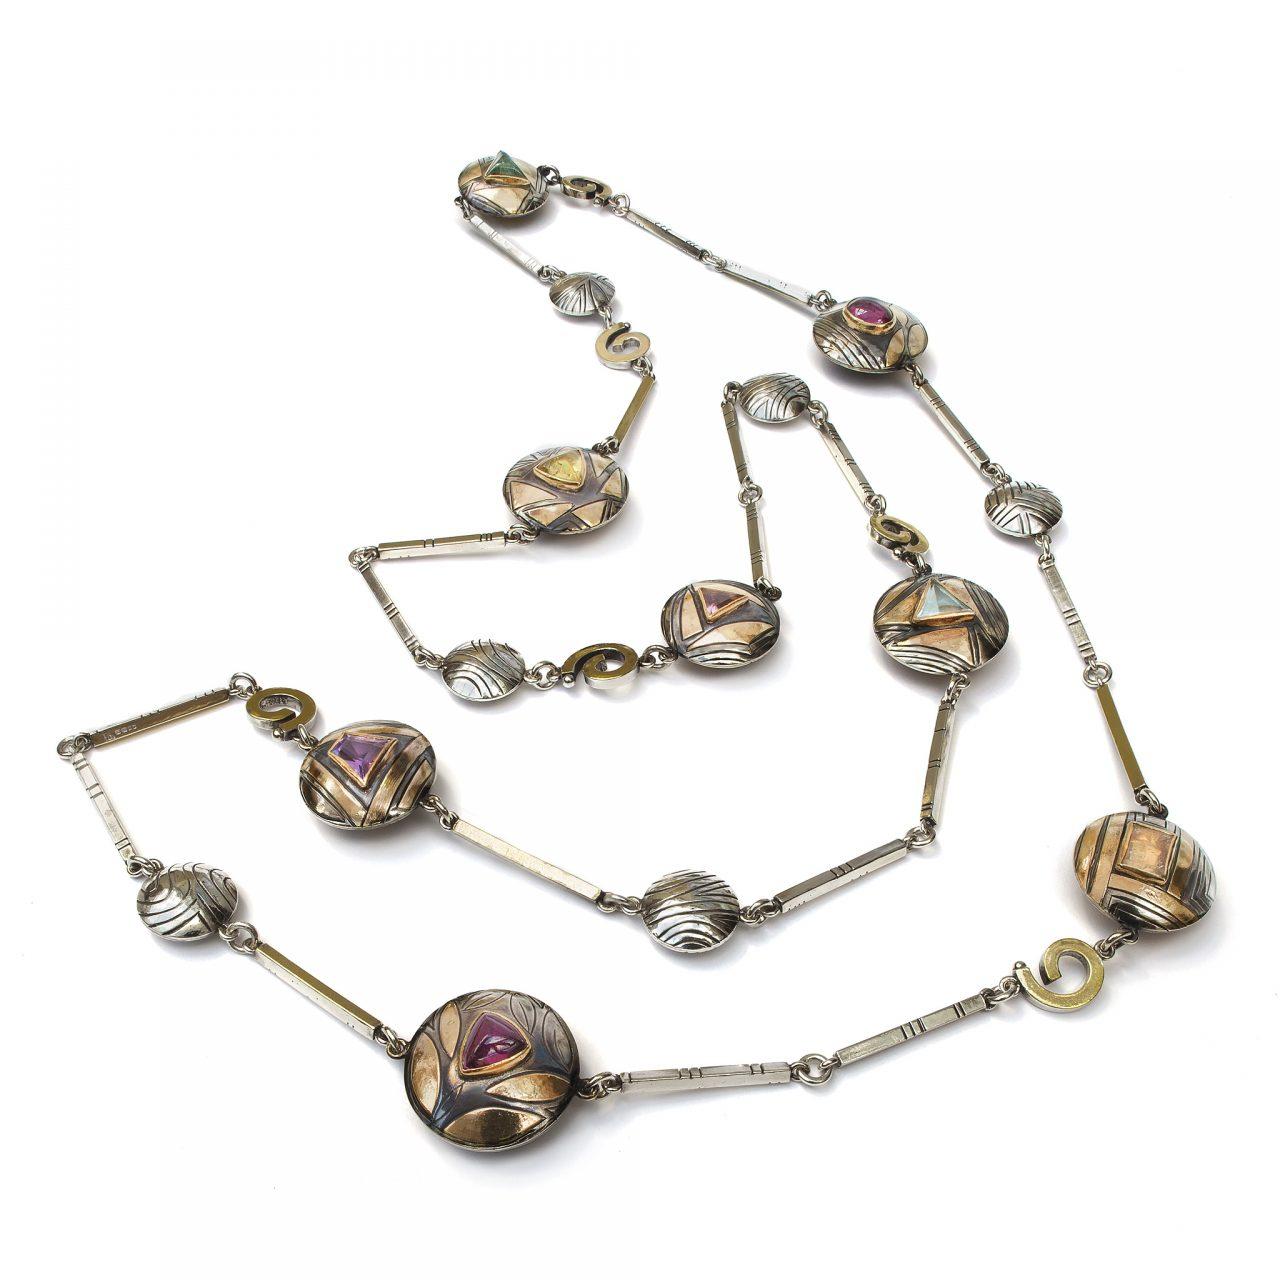 Necklace with Citrine, Aquamarine, Garnet, Tourmaline and Iolite